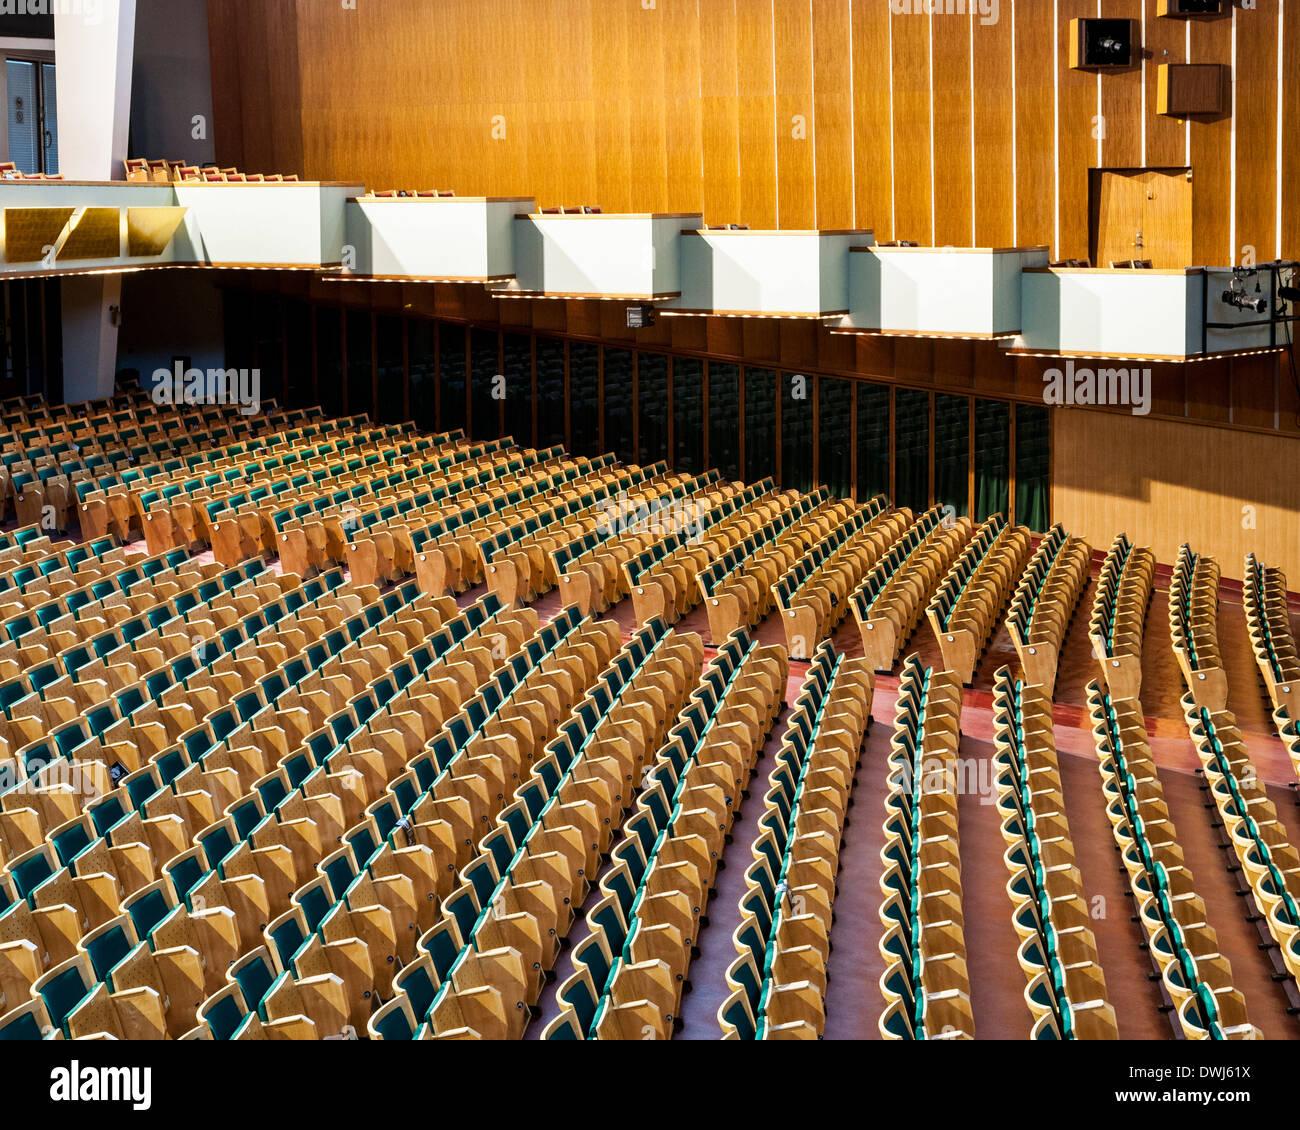 Tivoli Gardens, Copenhagen, Denmark. Architect: Various, 2014. Tivoli Koncertsal (Concert Hall). Stock Photo